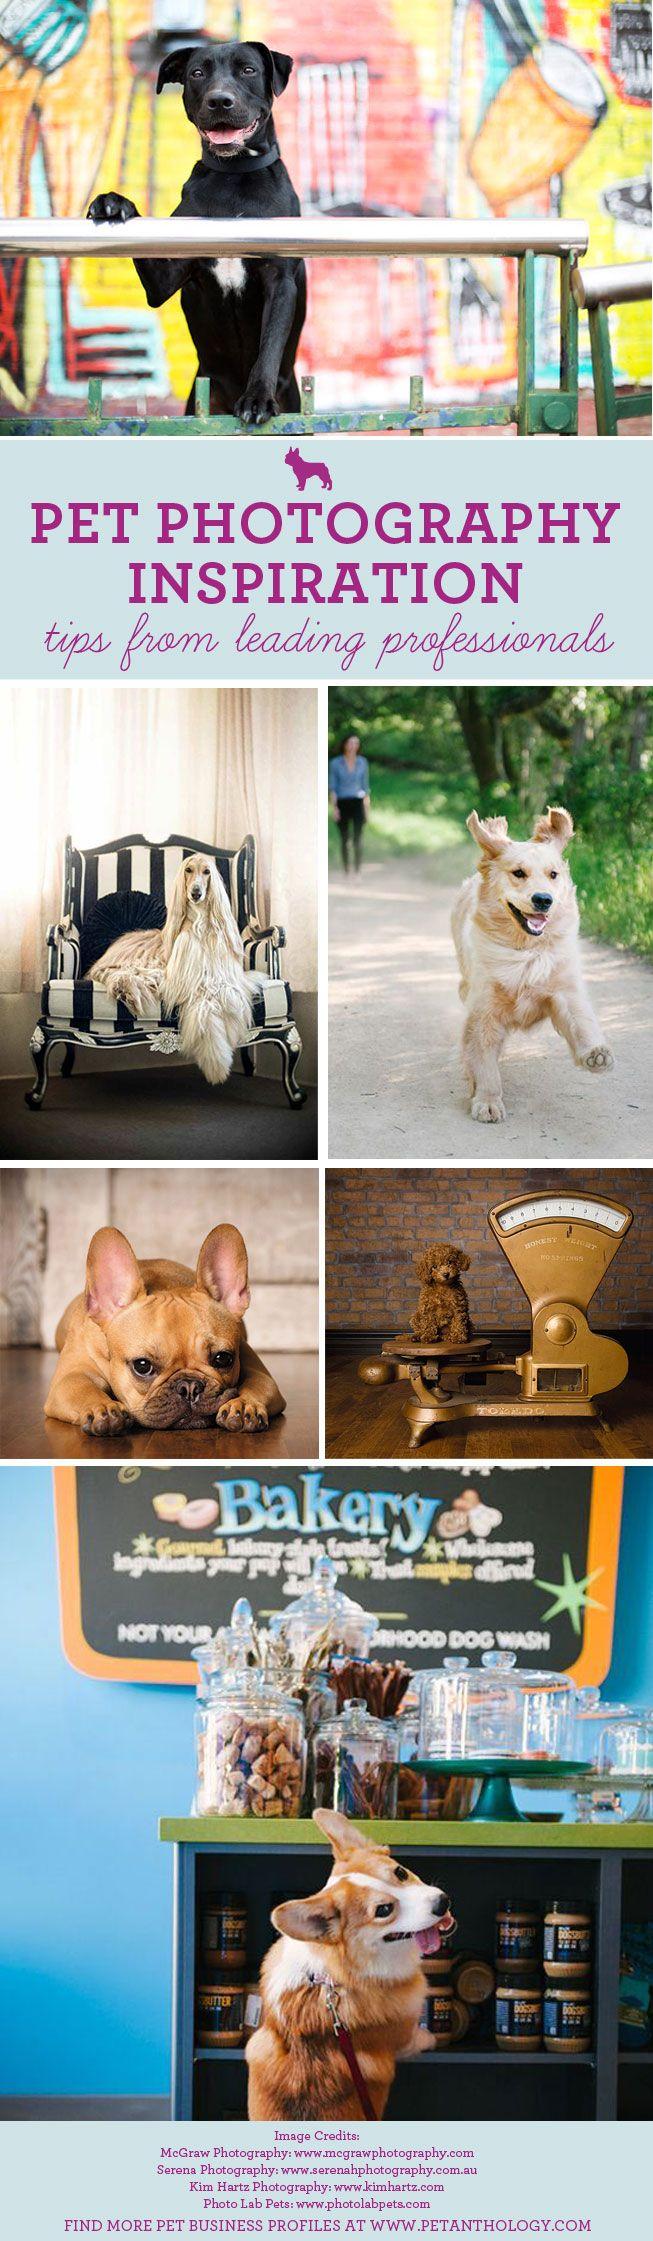 The Pet Anthology | Pet Business Profiles - Inspiration from leading Pet Photographers at www.petanthology.com  #pet #photography #tips